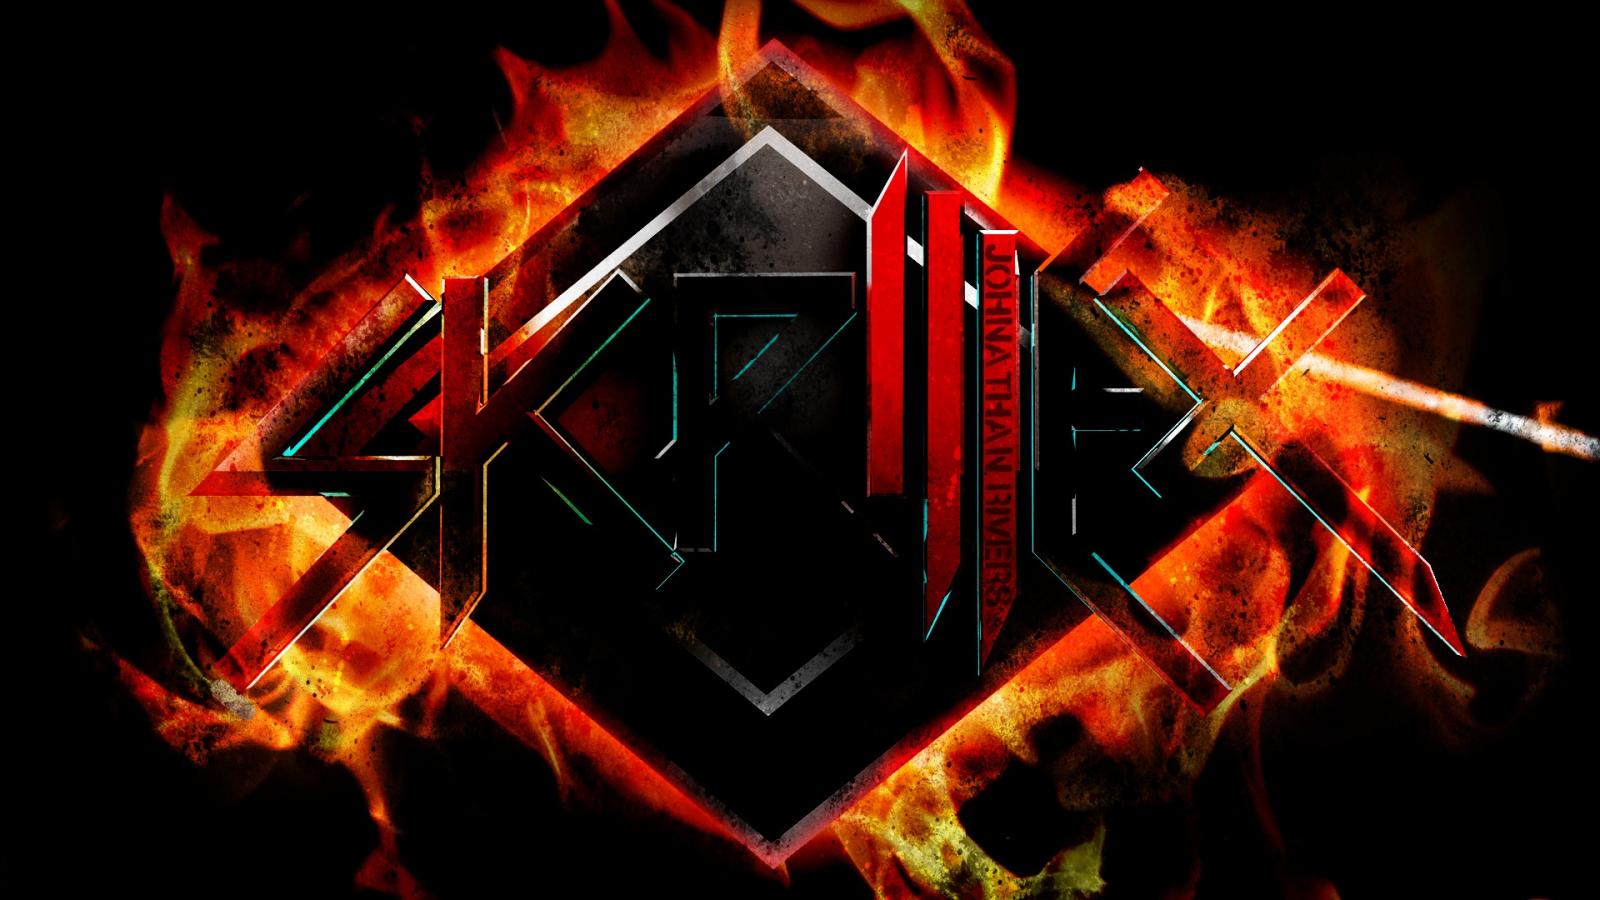 Free Download Skrillex Logos Wallpaper Hd 1080p Taringa 1920x1080